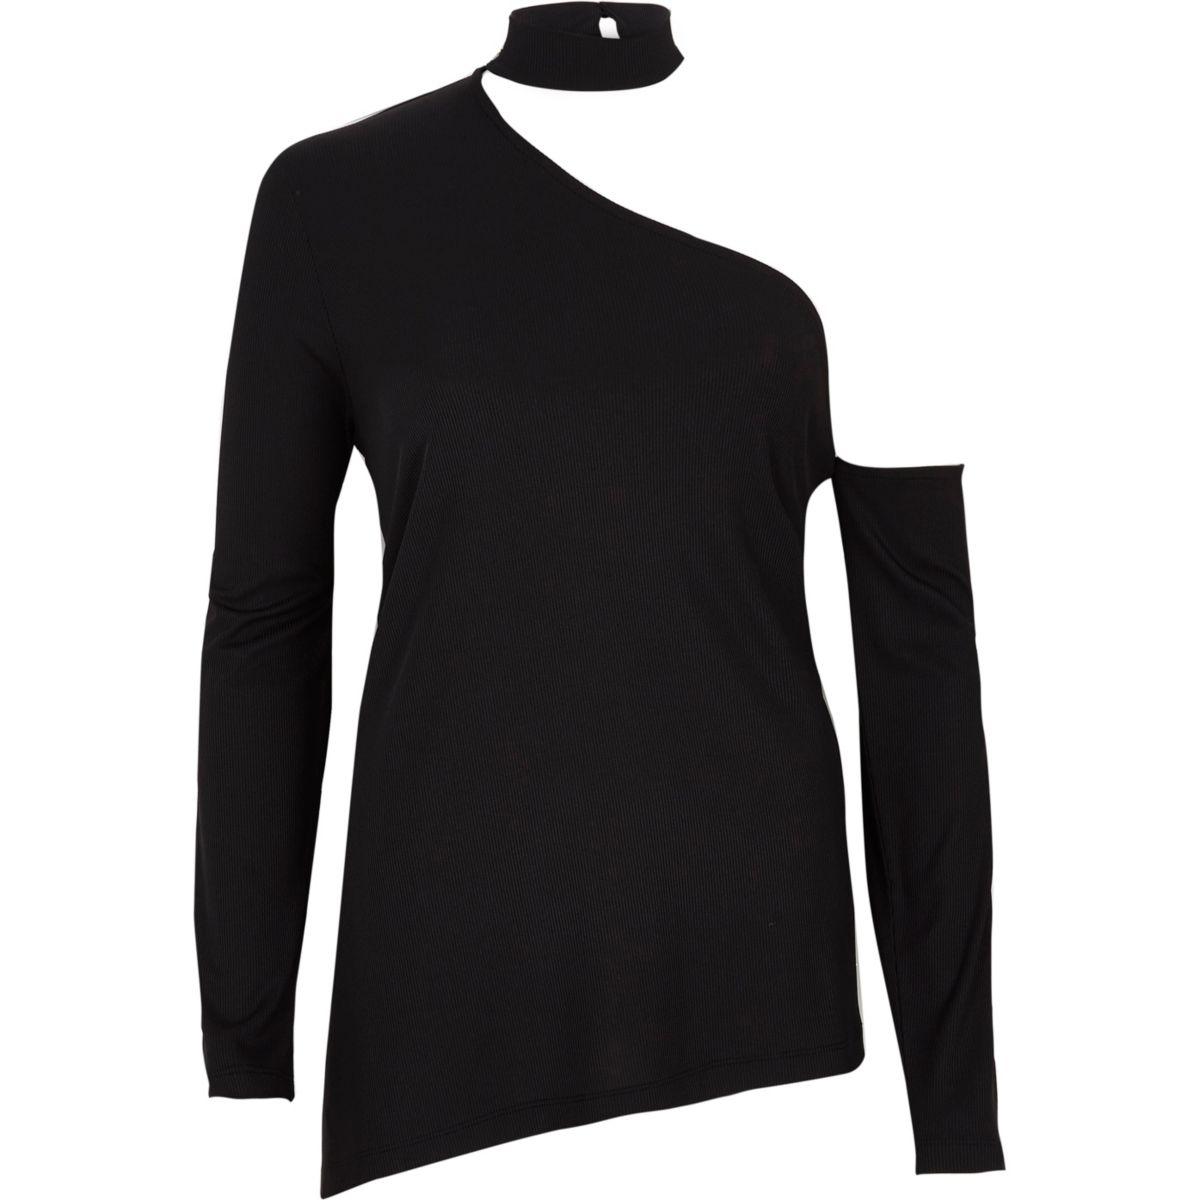 Black rib one shoulder choker top